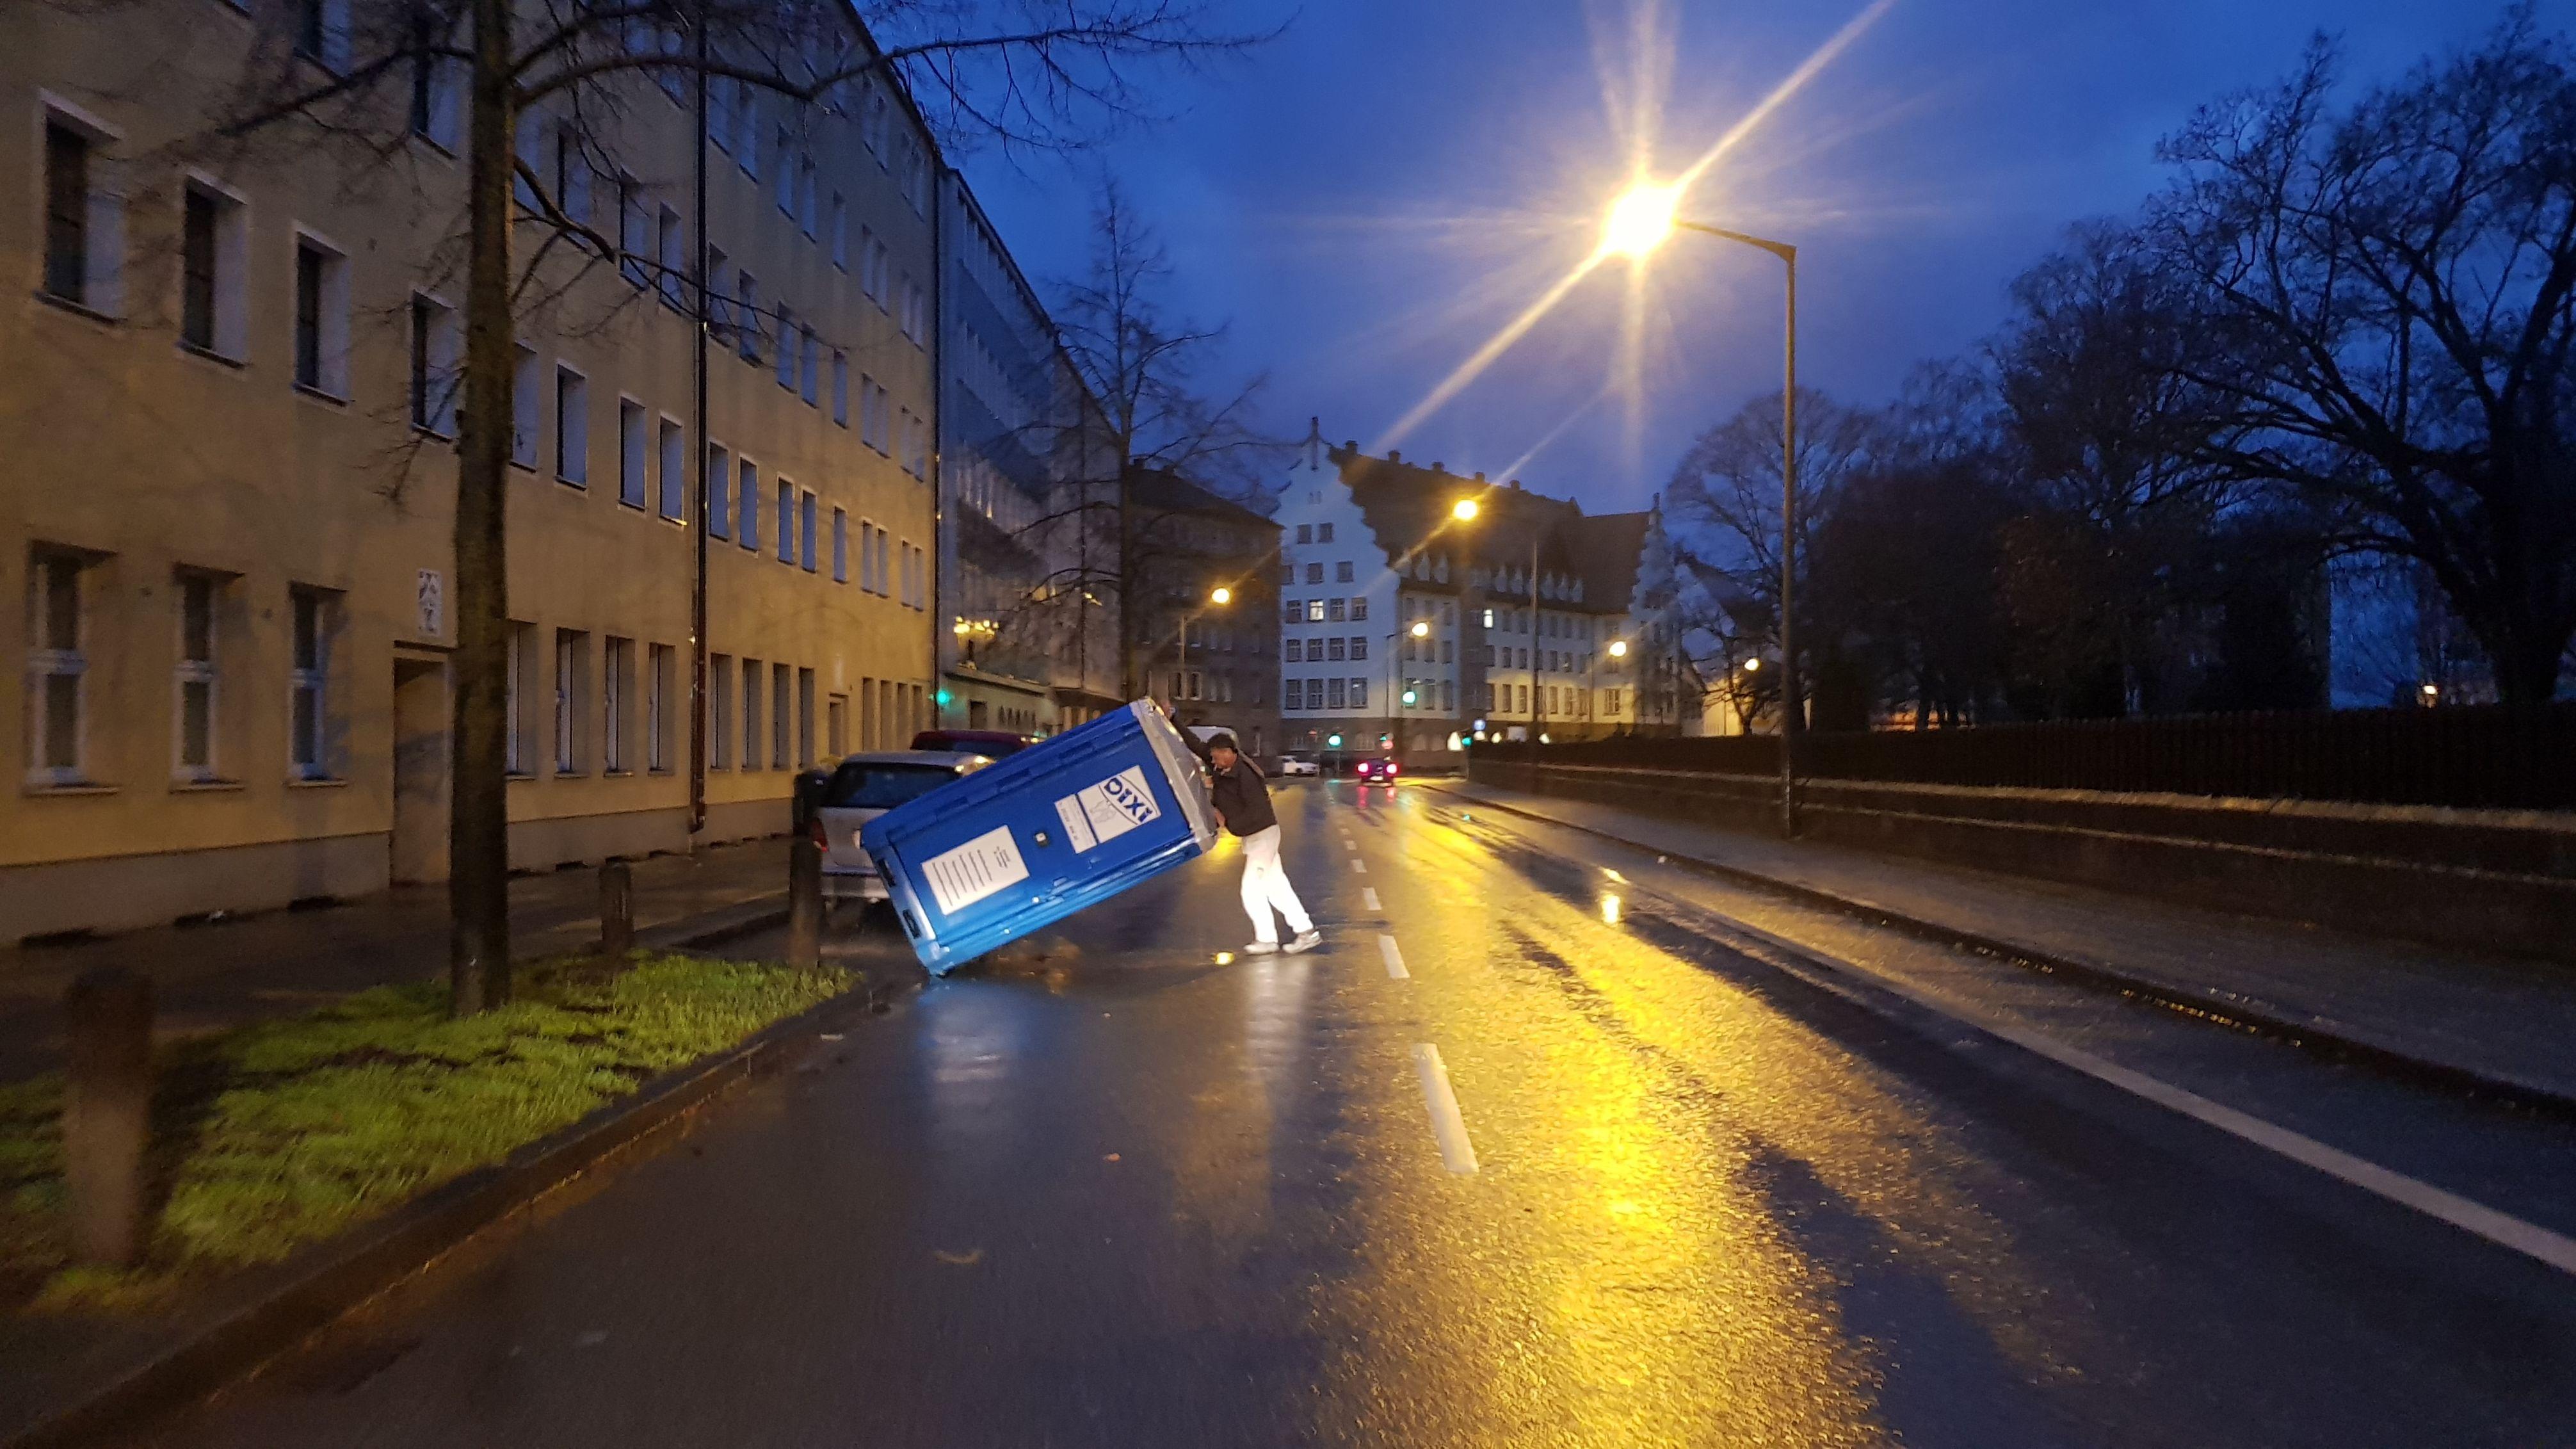 Wegen dem Sturm umgestürzt: Mann stellt Toilettenhäuschen in Nürnberg wieder auf